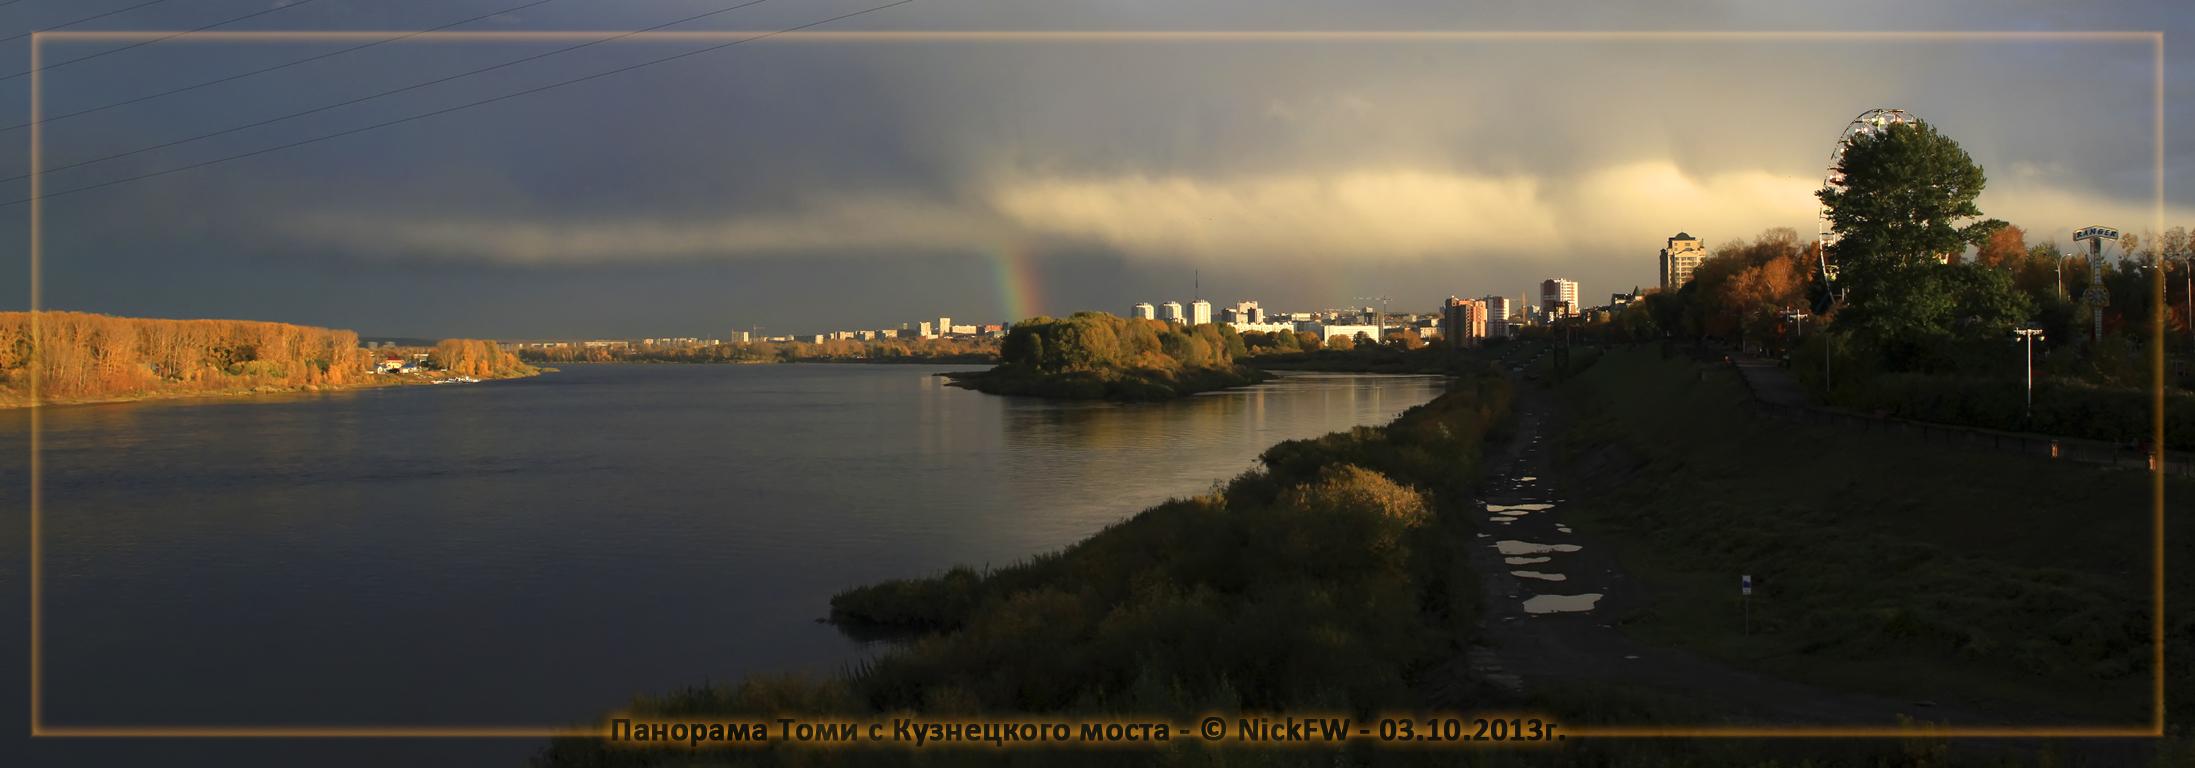 Панорама Томи с Кузнецкого моста (© NickFW - 03.10.2013)